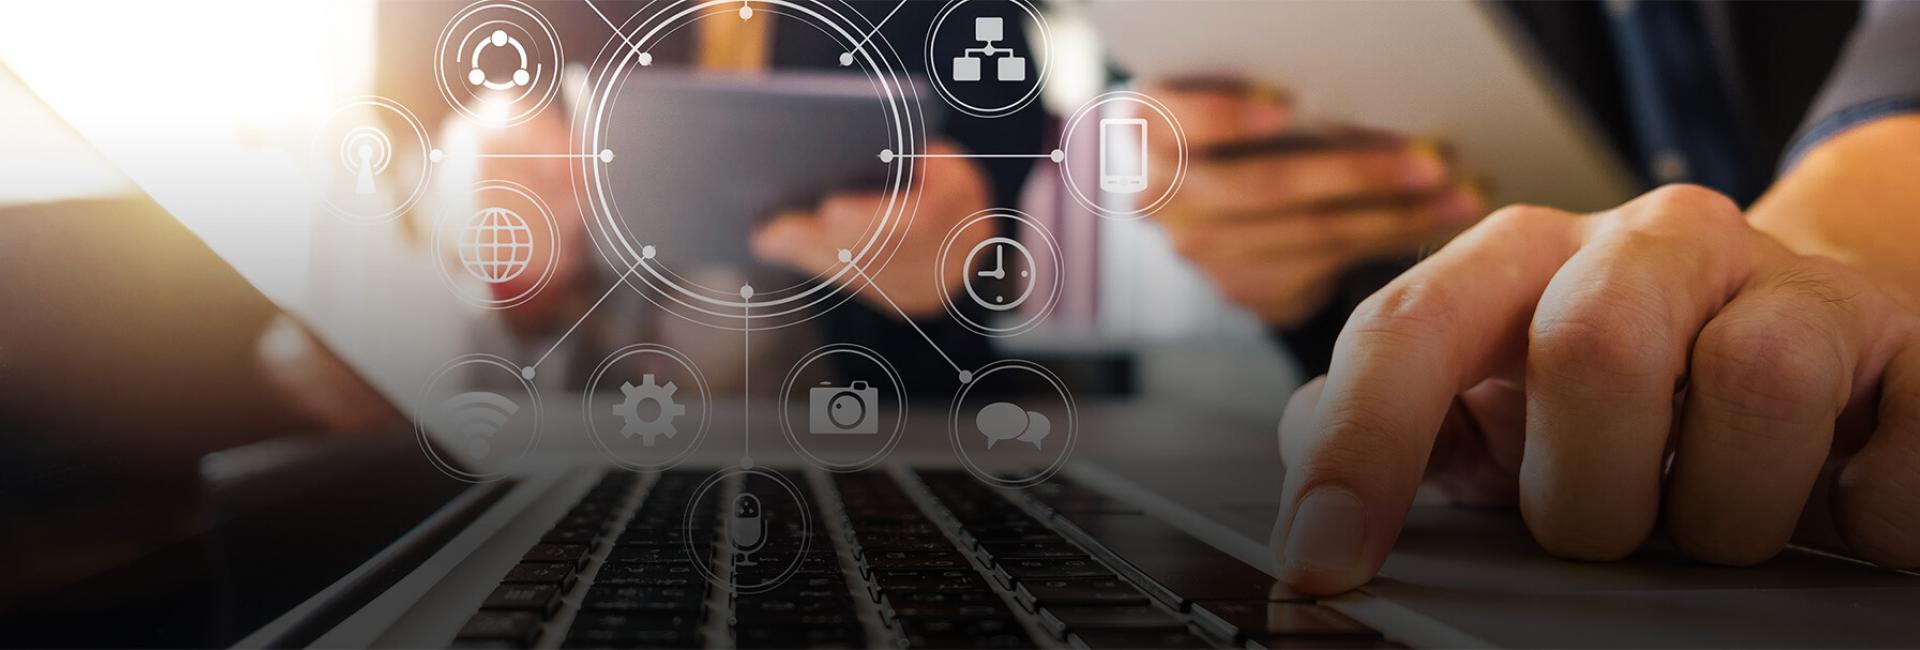 What Is Fintech? The Fintech Industry | Envestnet | Yodlee